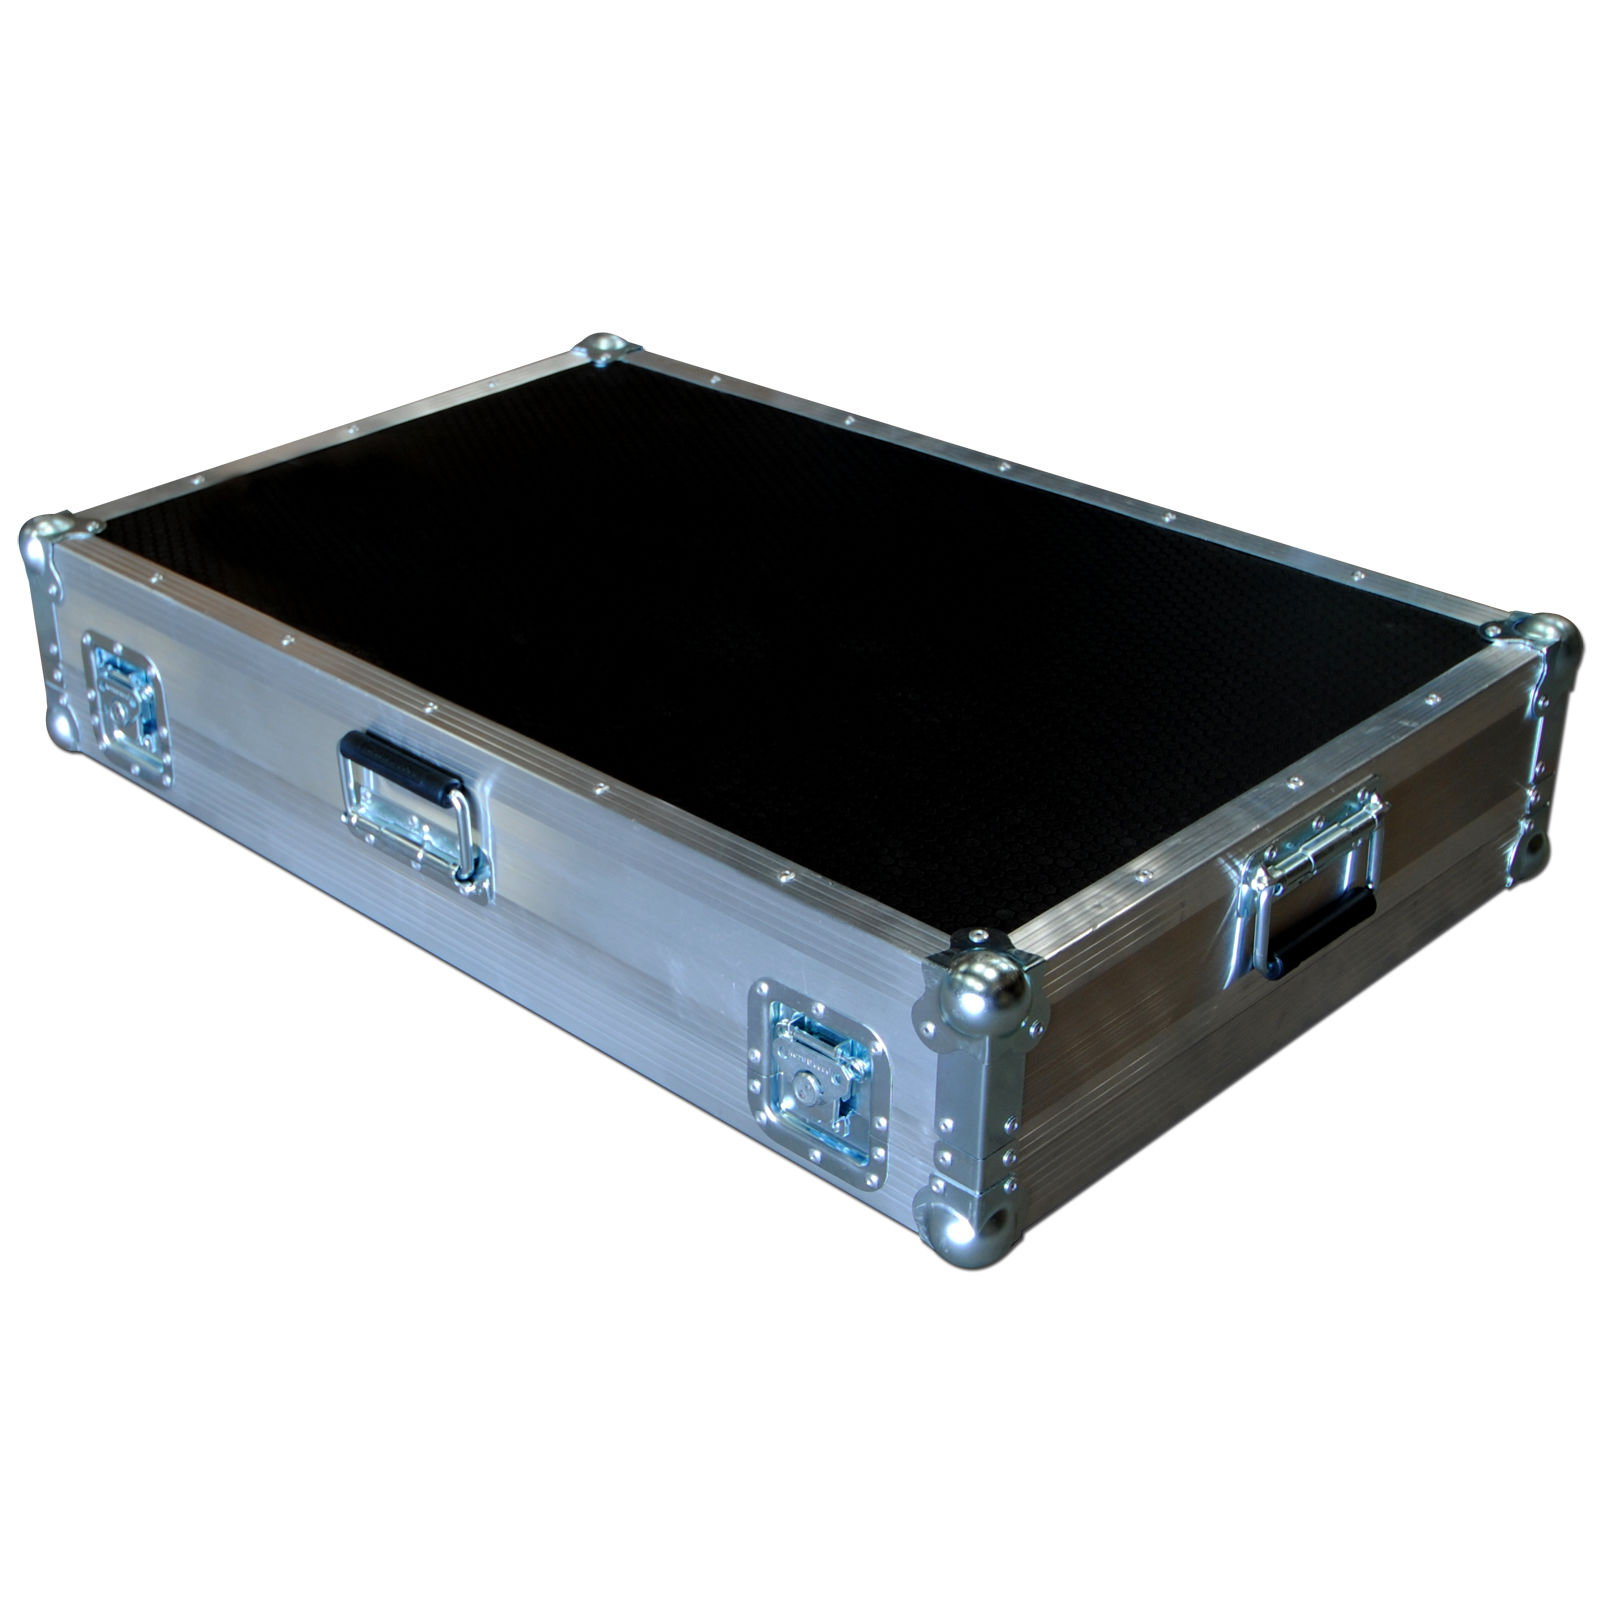 sc 1 st  Flightcase Warehouse & Strand 200 24-48 Lighting Control Desk Flight Case azcodes.com